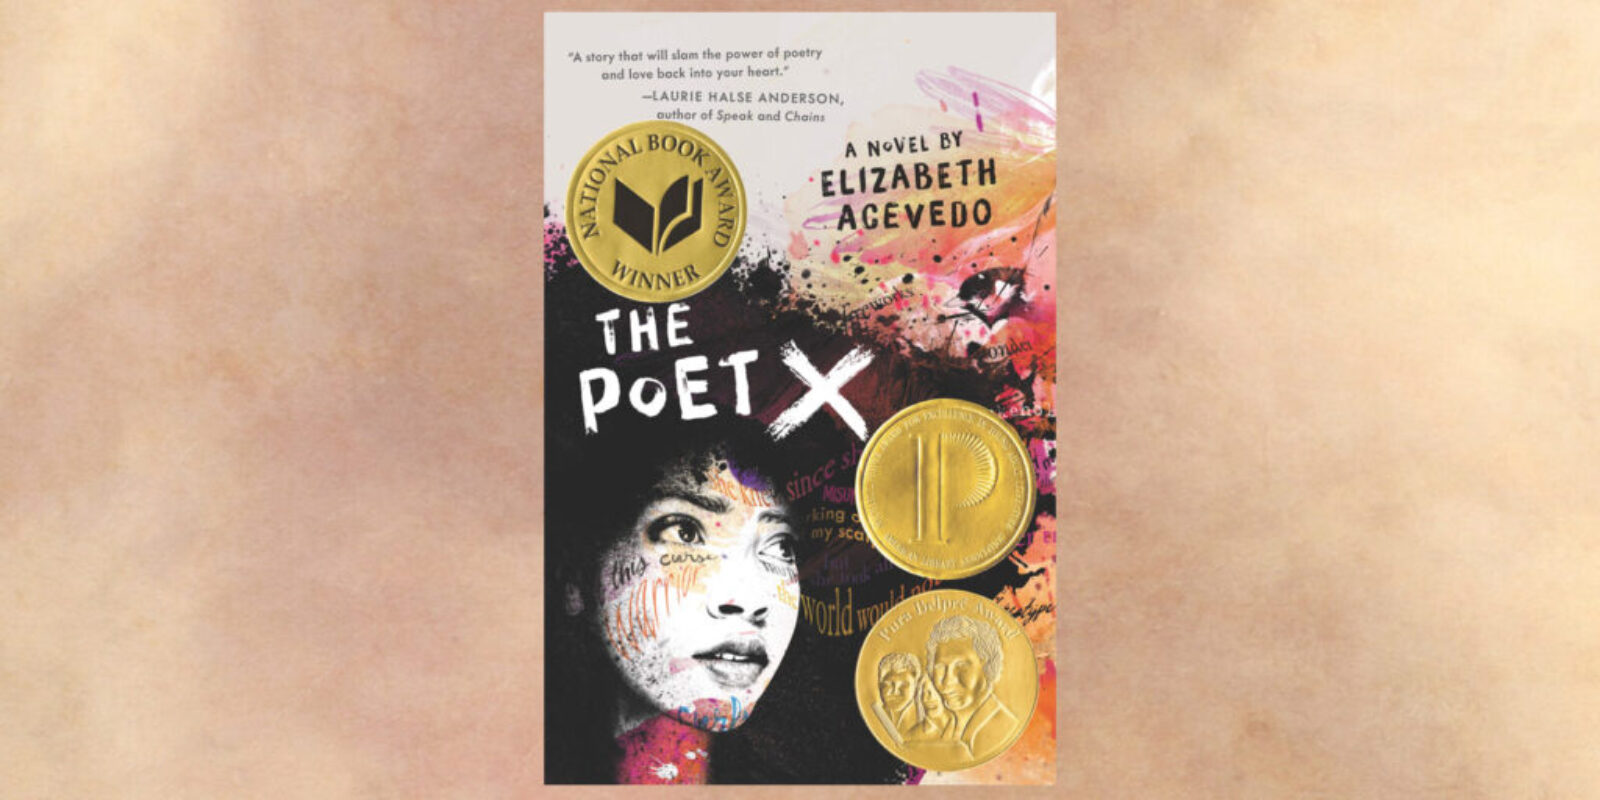 The-Poet-X-by-Elizabeth-Acevedo-Book-Header